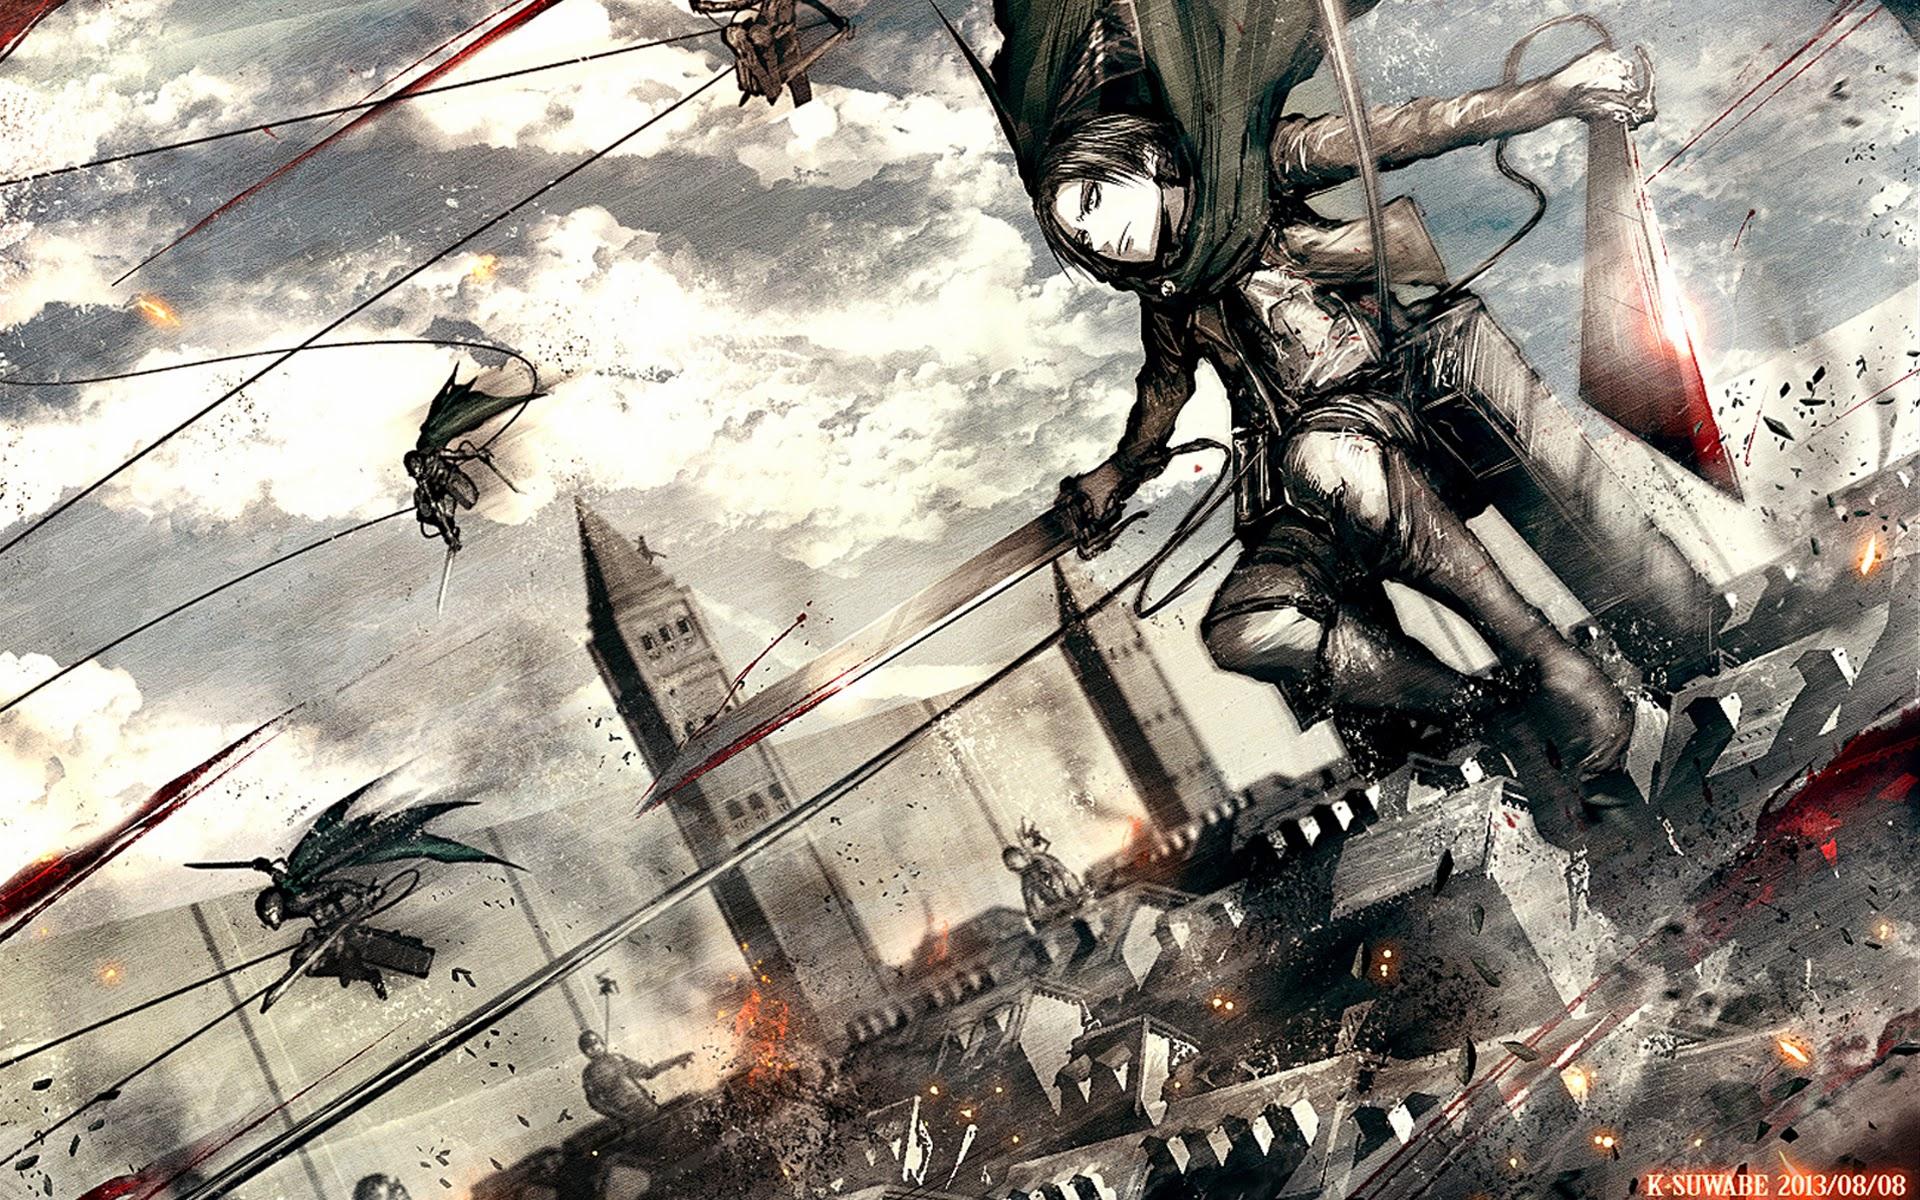 levi anime attack on titan shingeki no kyojin 1920x1200 9v 1920x1200